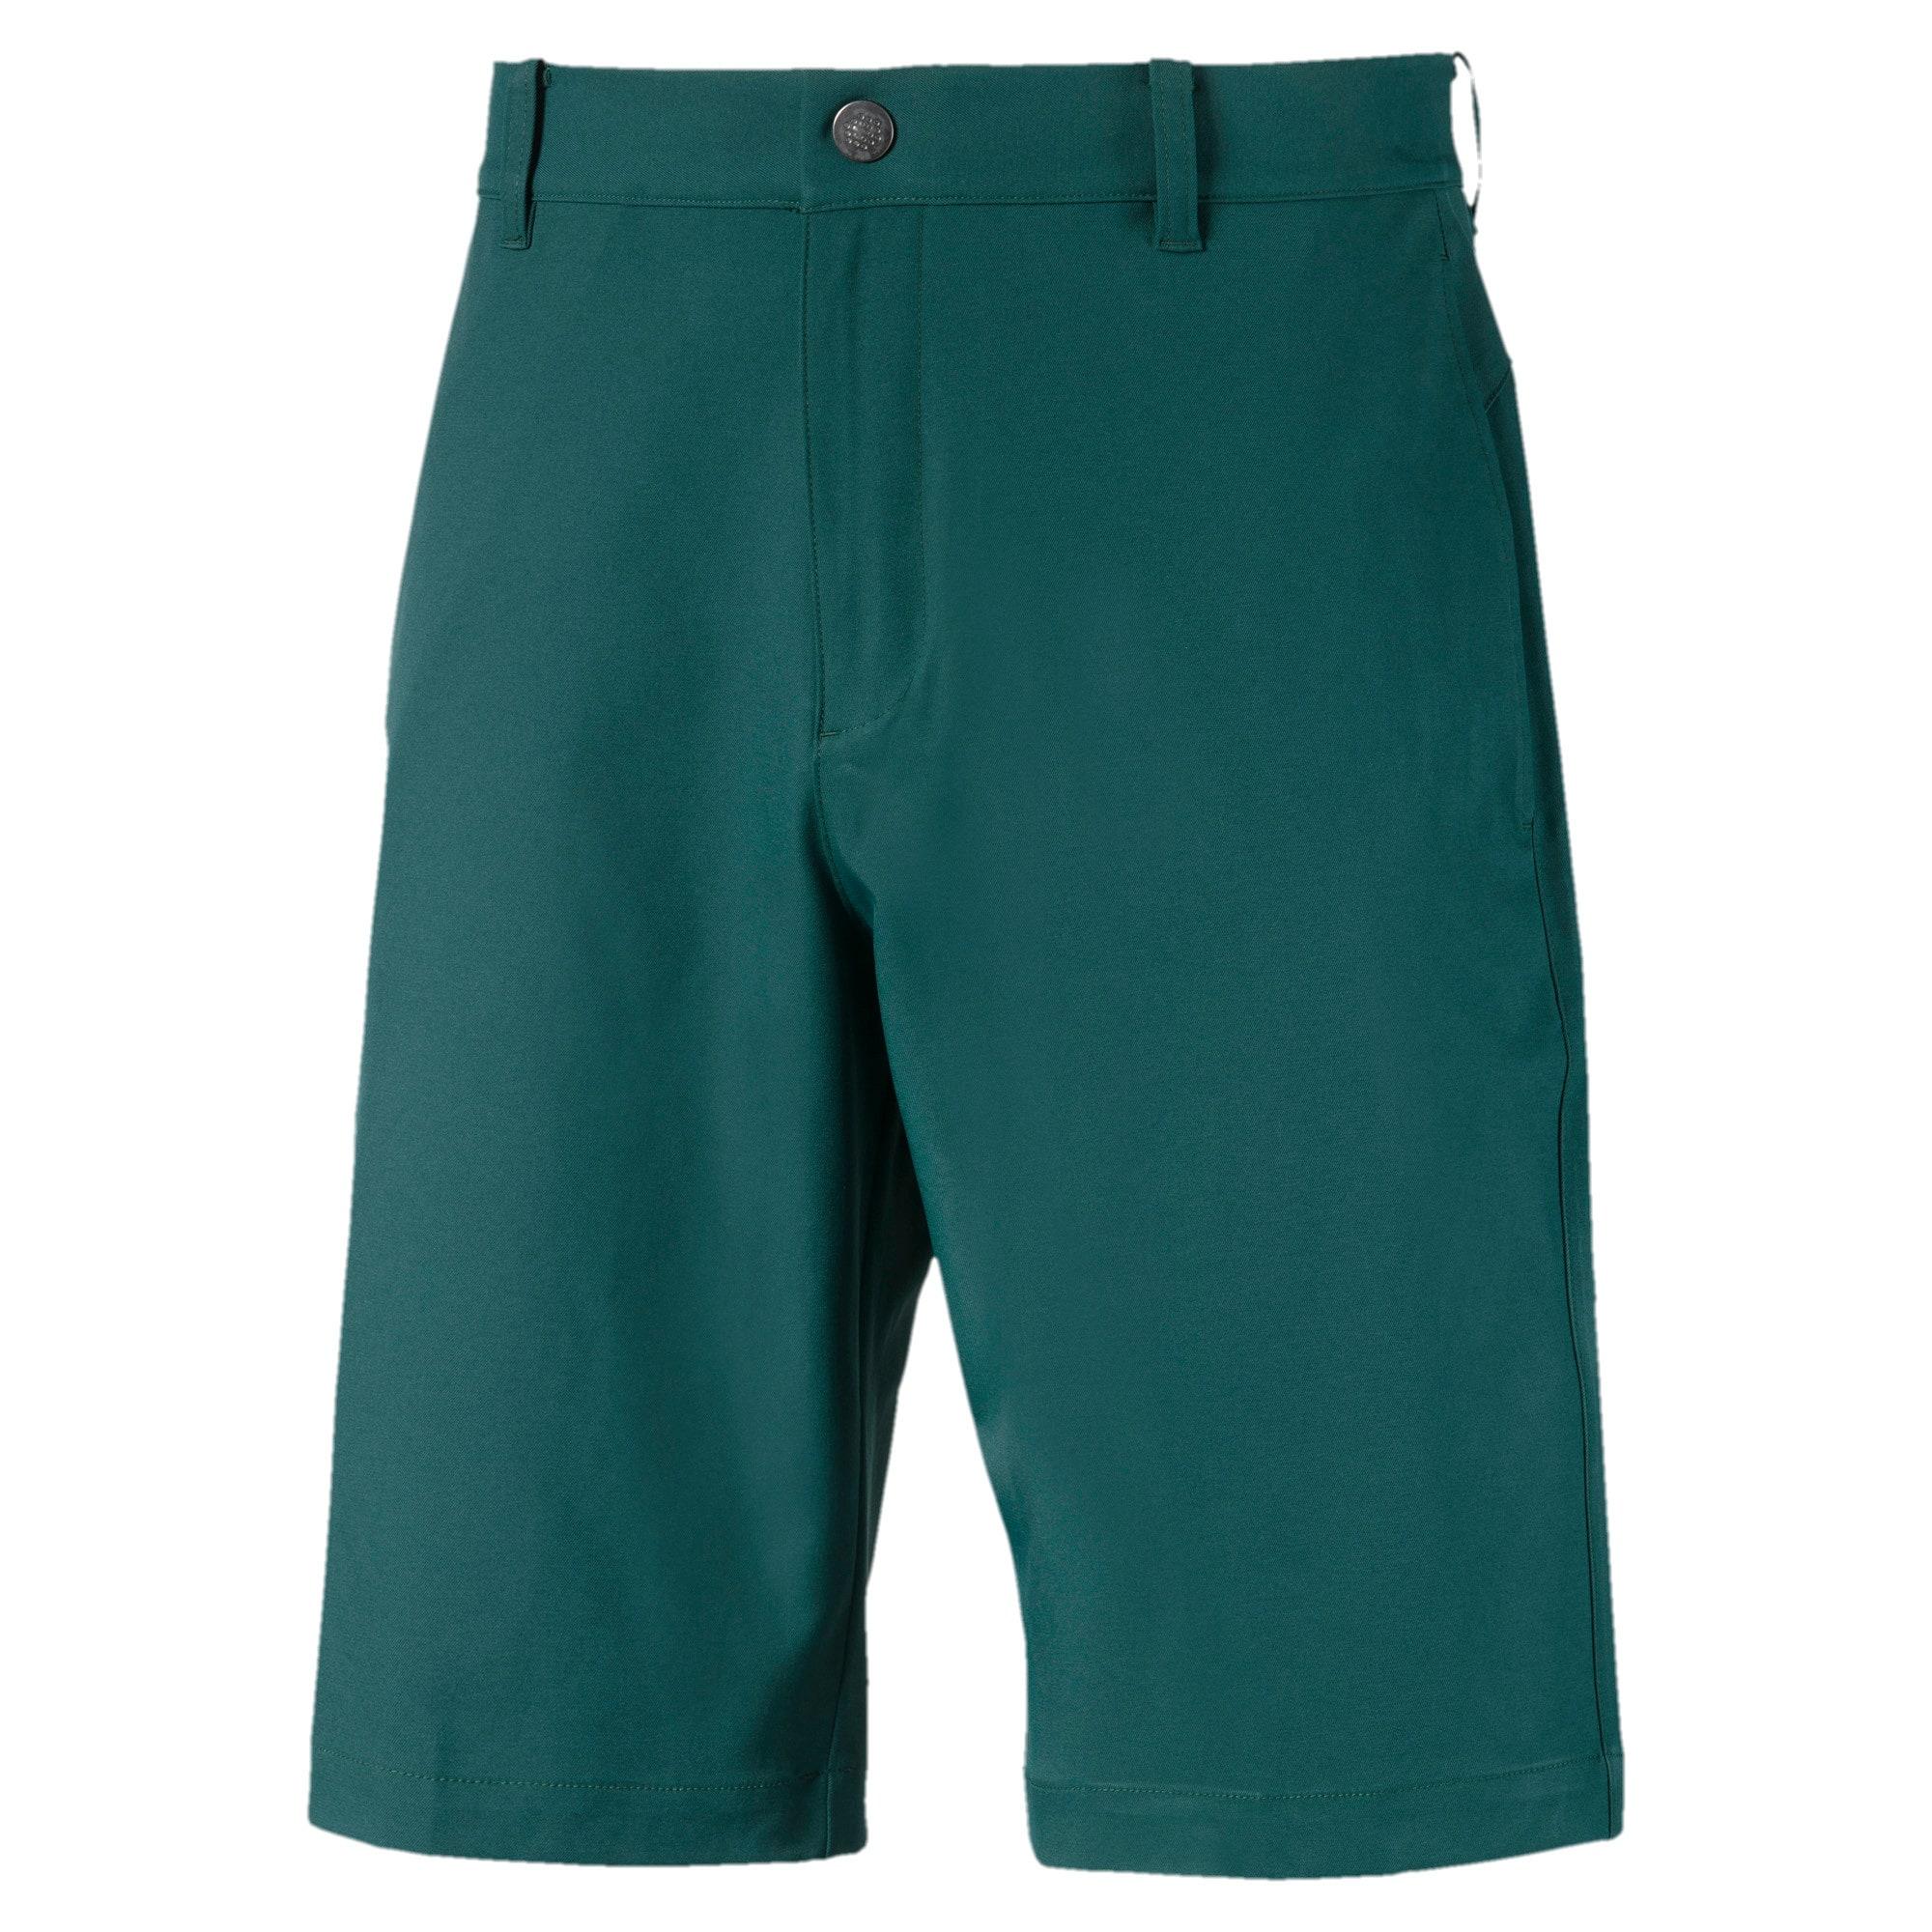 Thumbnail 1 of Jackpot Men's Shorts, Ponderosa Pine, medium